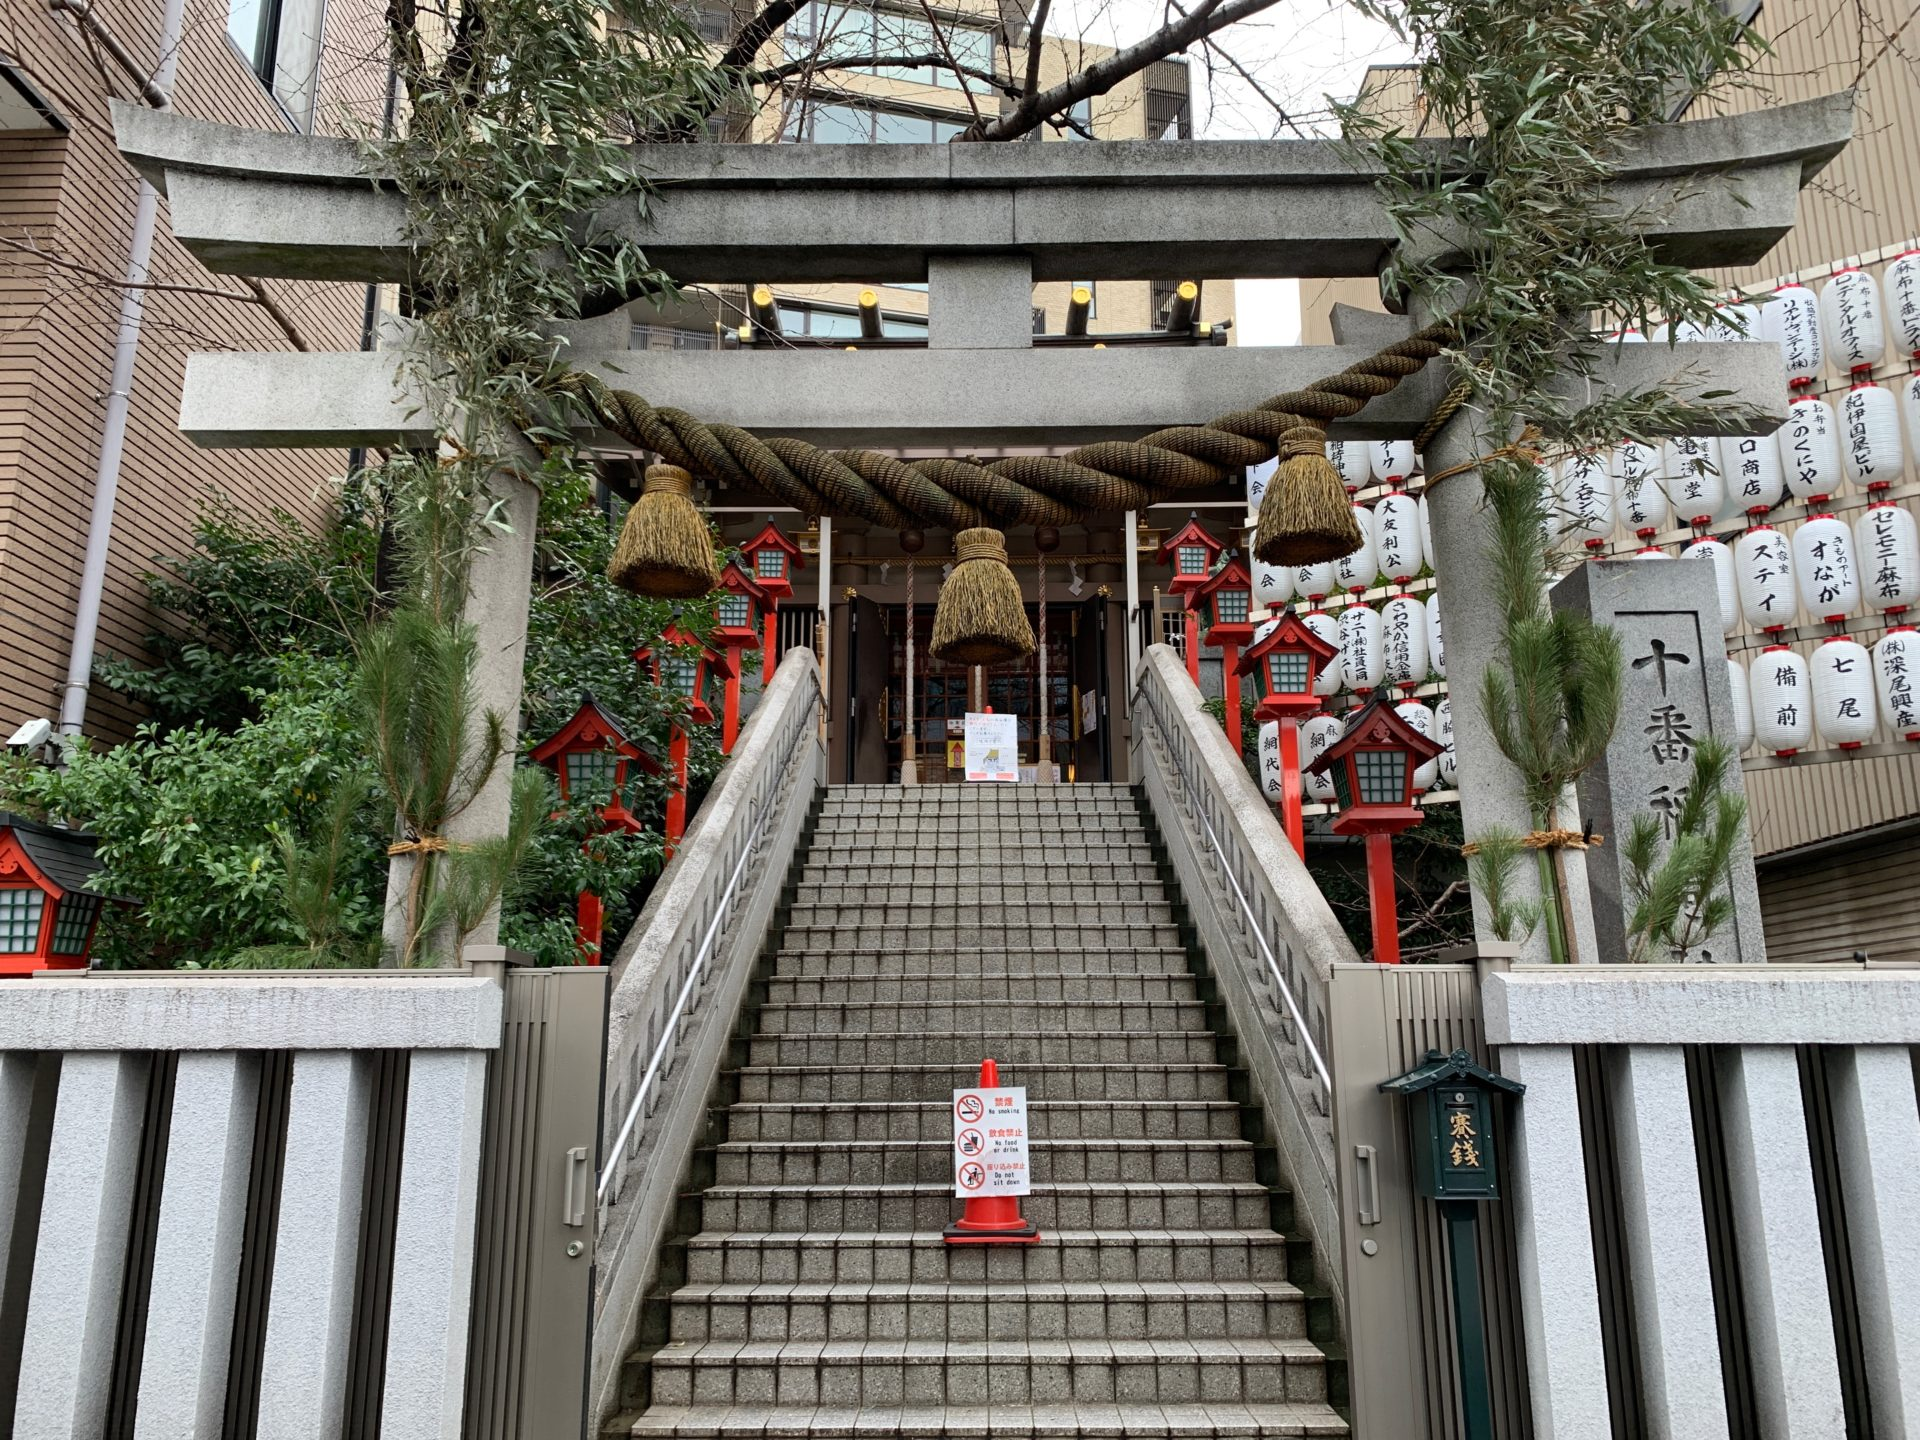 十番稲荷神社の本殿